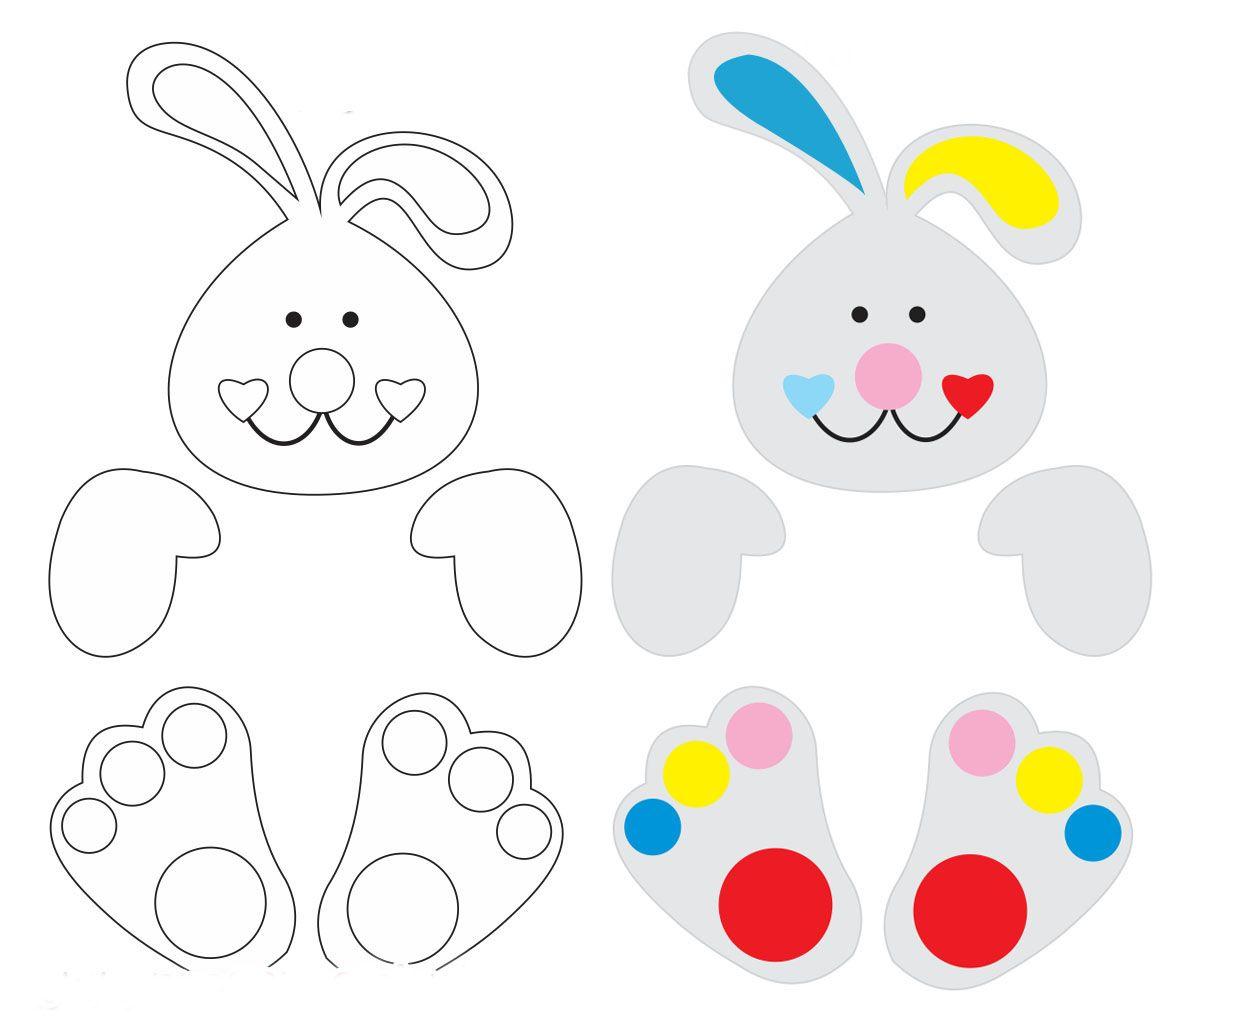 Conejo con dulces para Pascua | pascuas | Pinterest | Conejo, Dulces ...